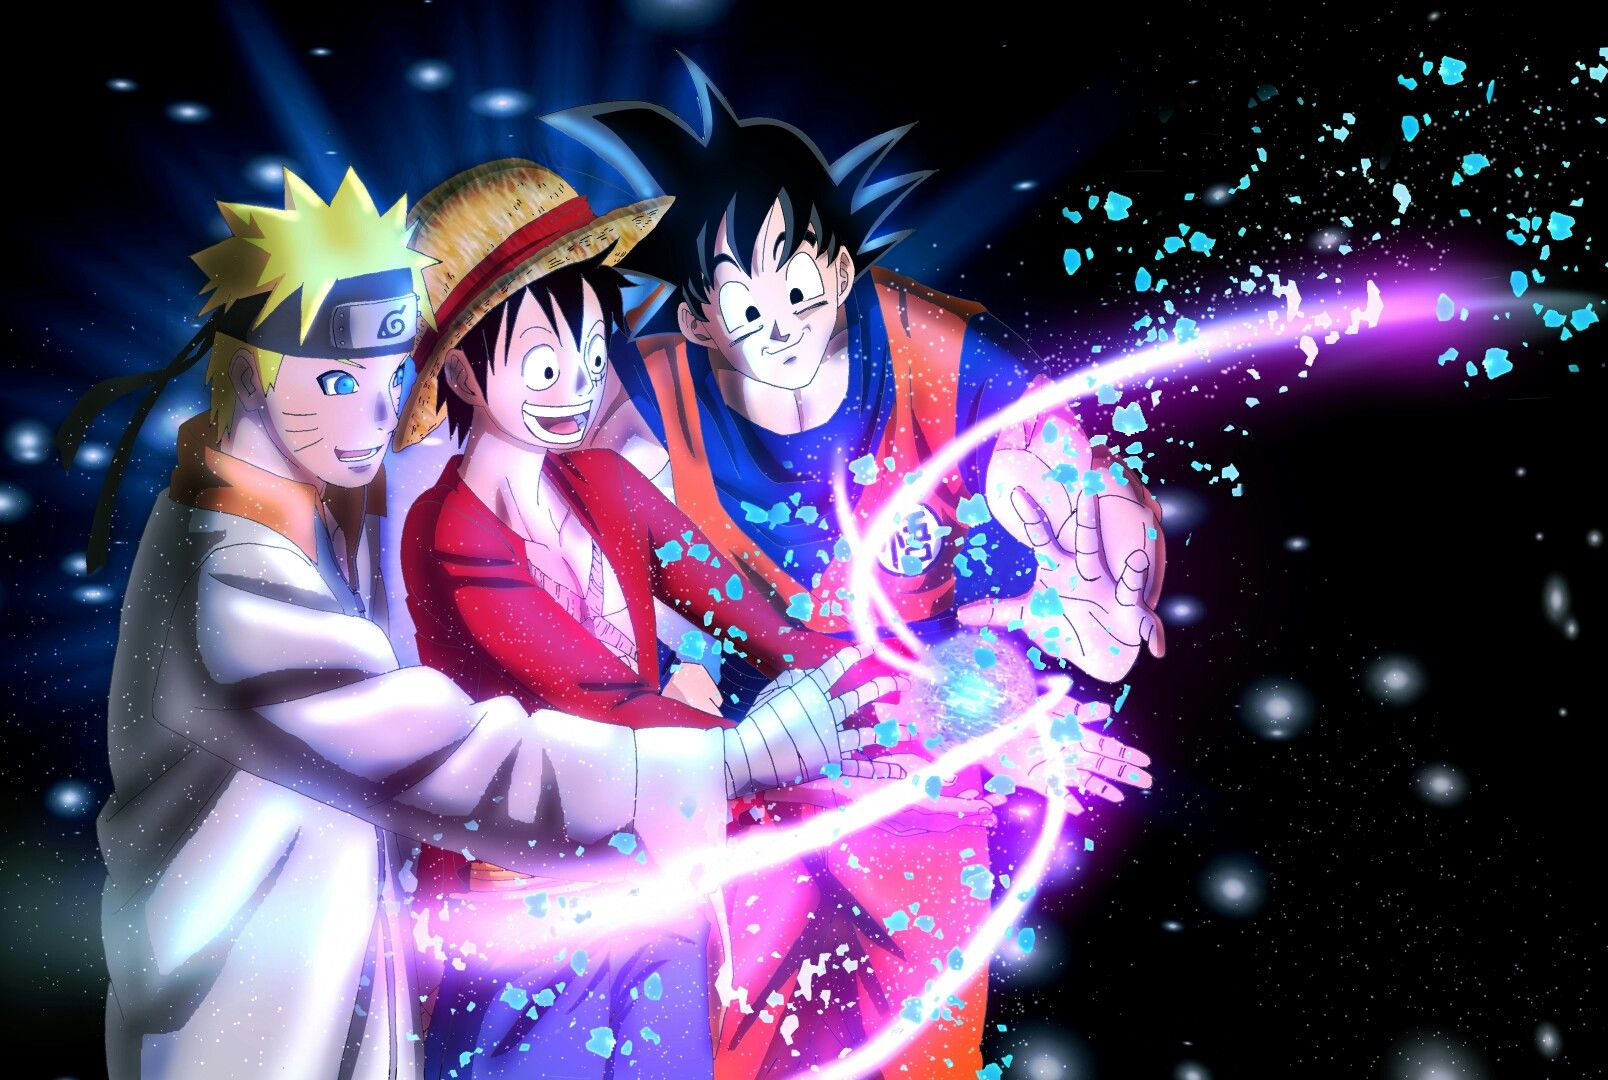 Goku Luffy And Naruto Anime Anime Crossover Manga Anime One Piece